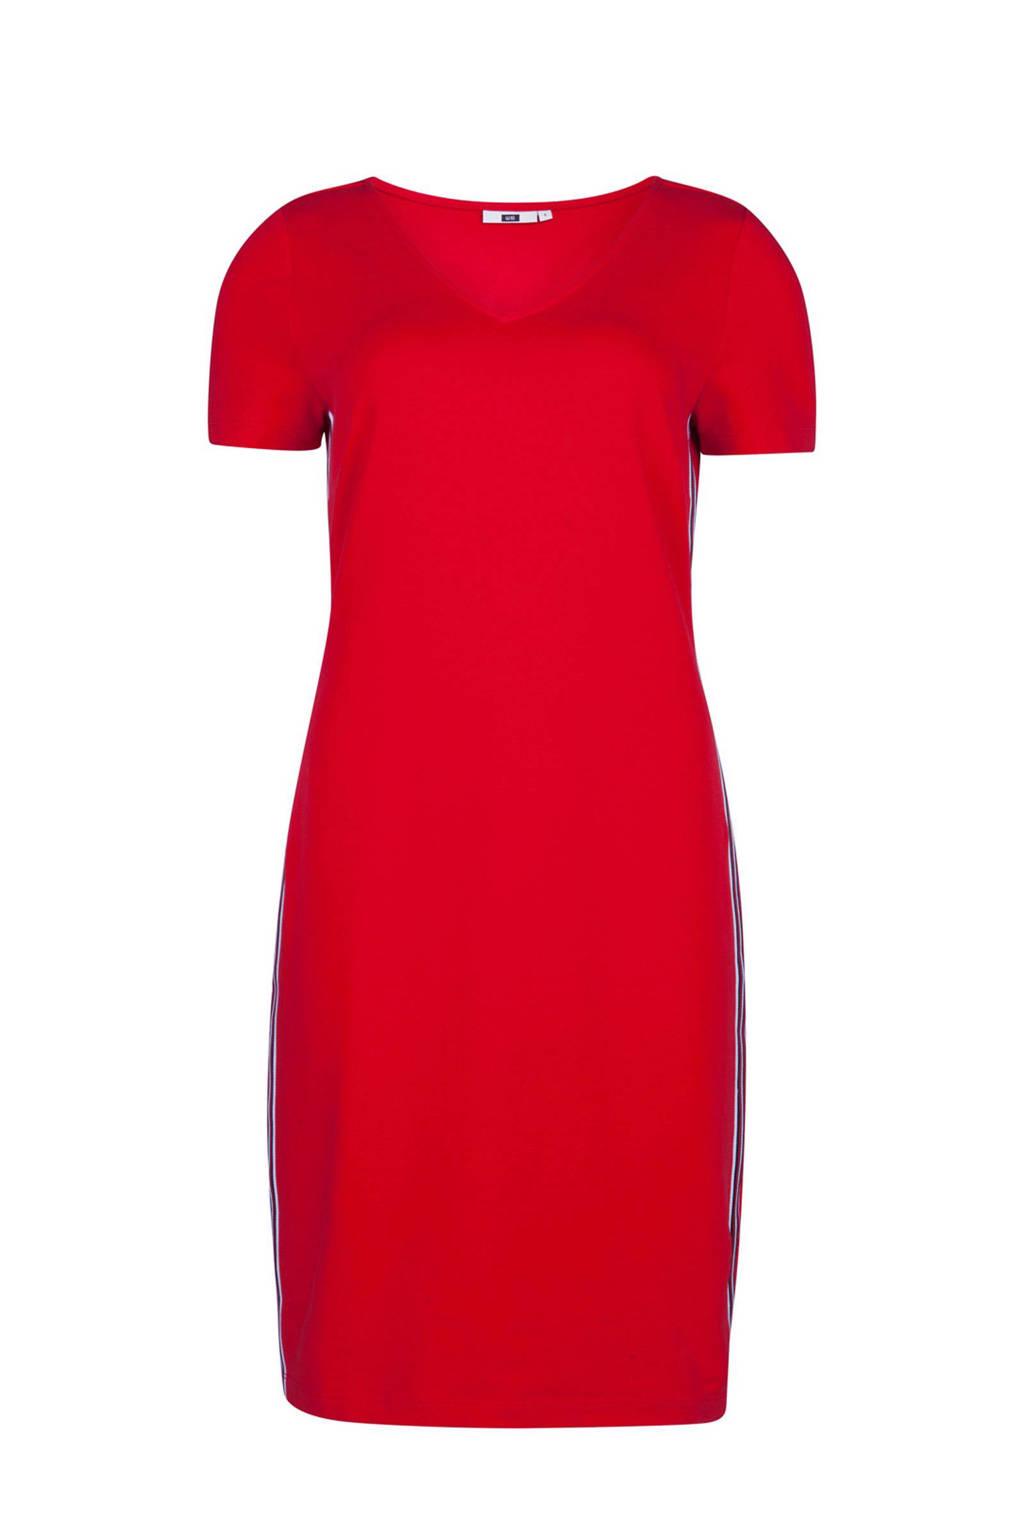 WE Fashion jurk met contrastbies rood, Rood/wit